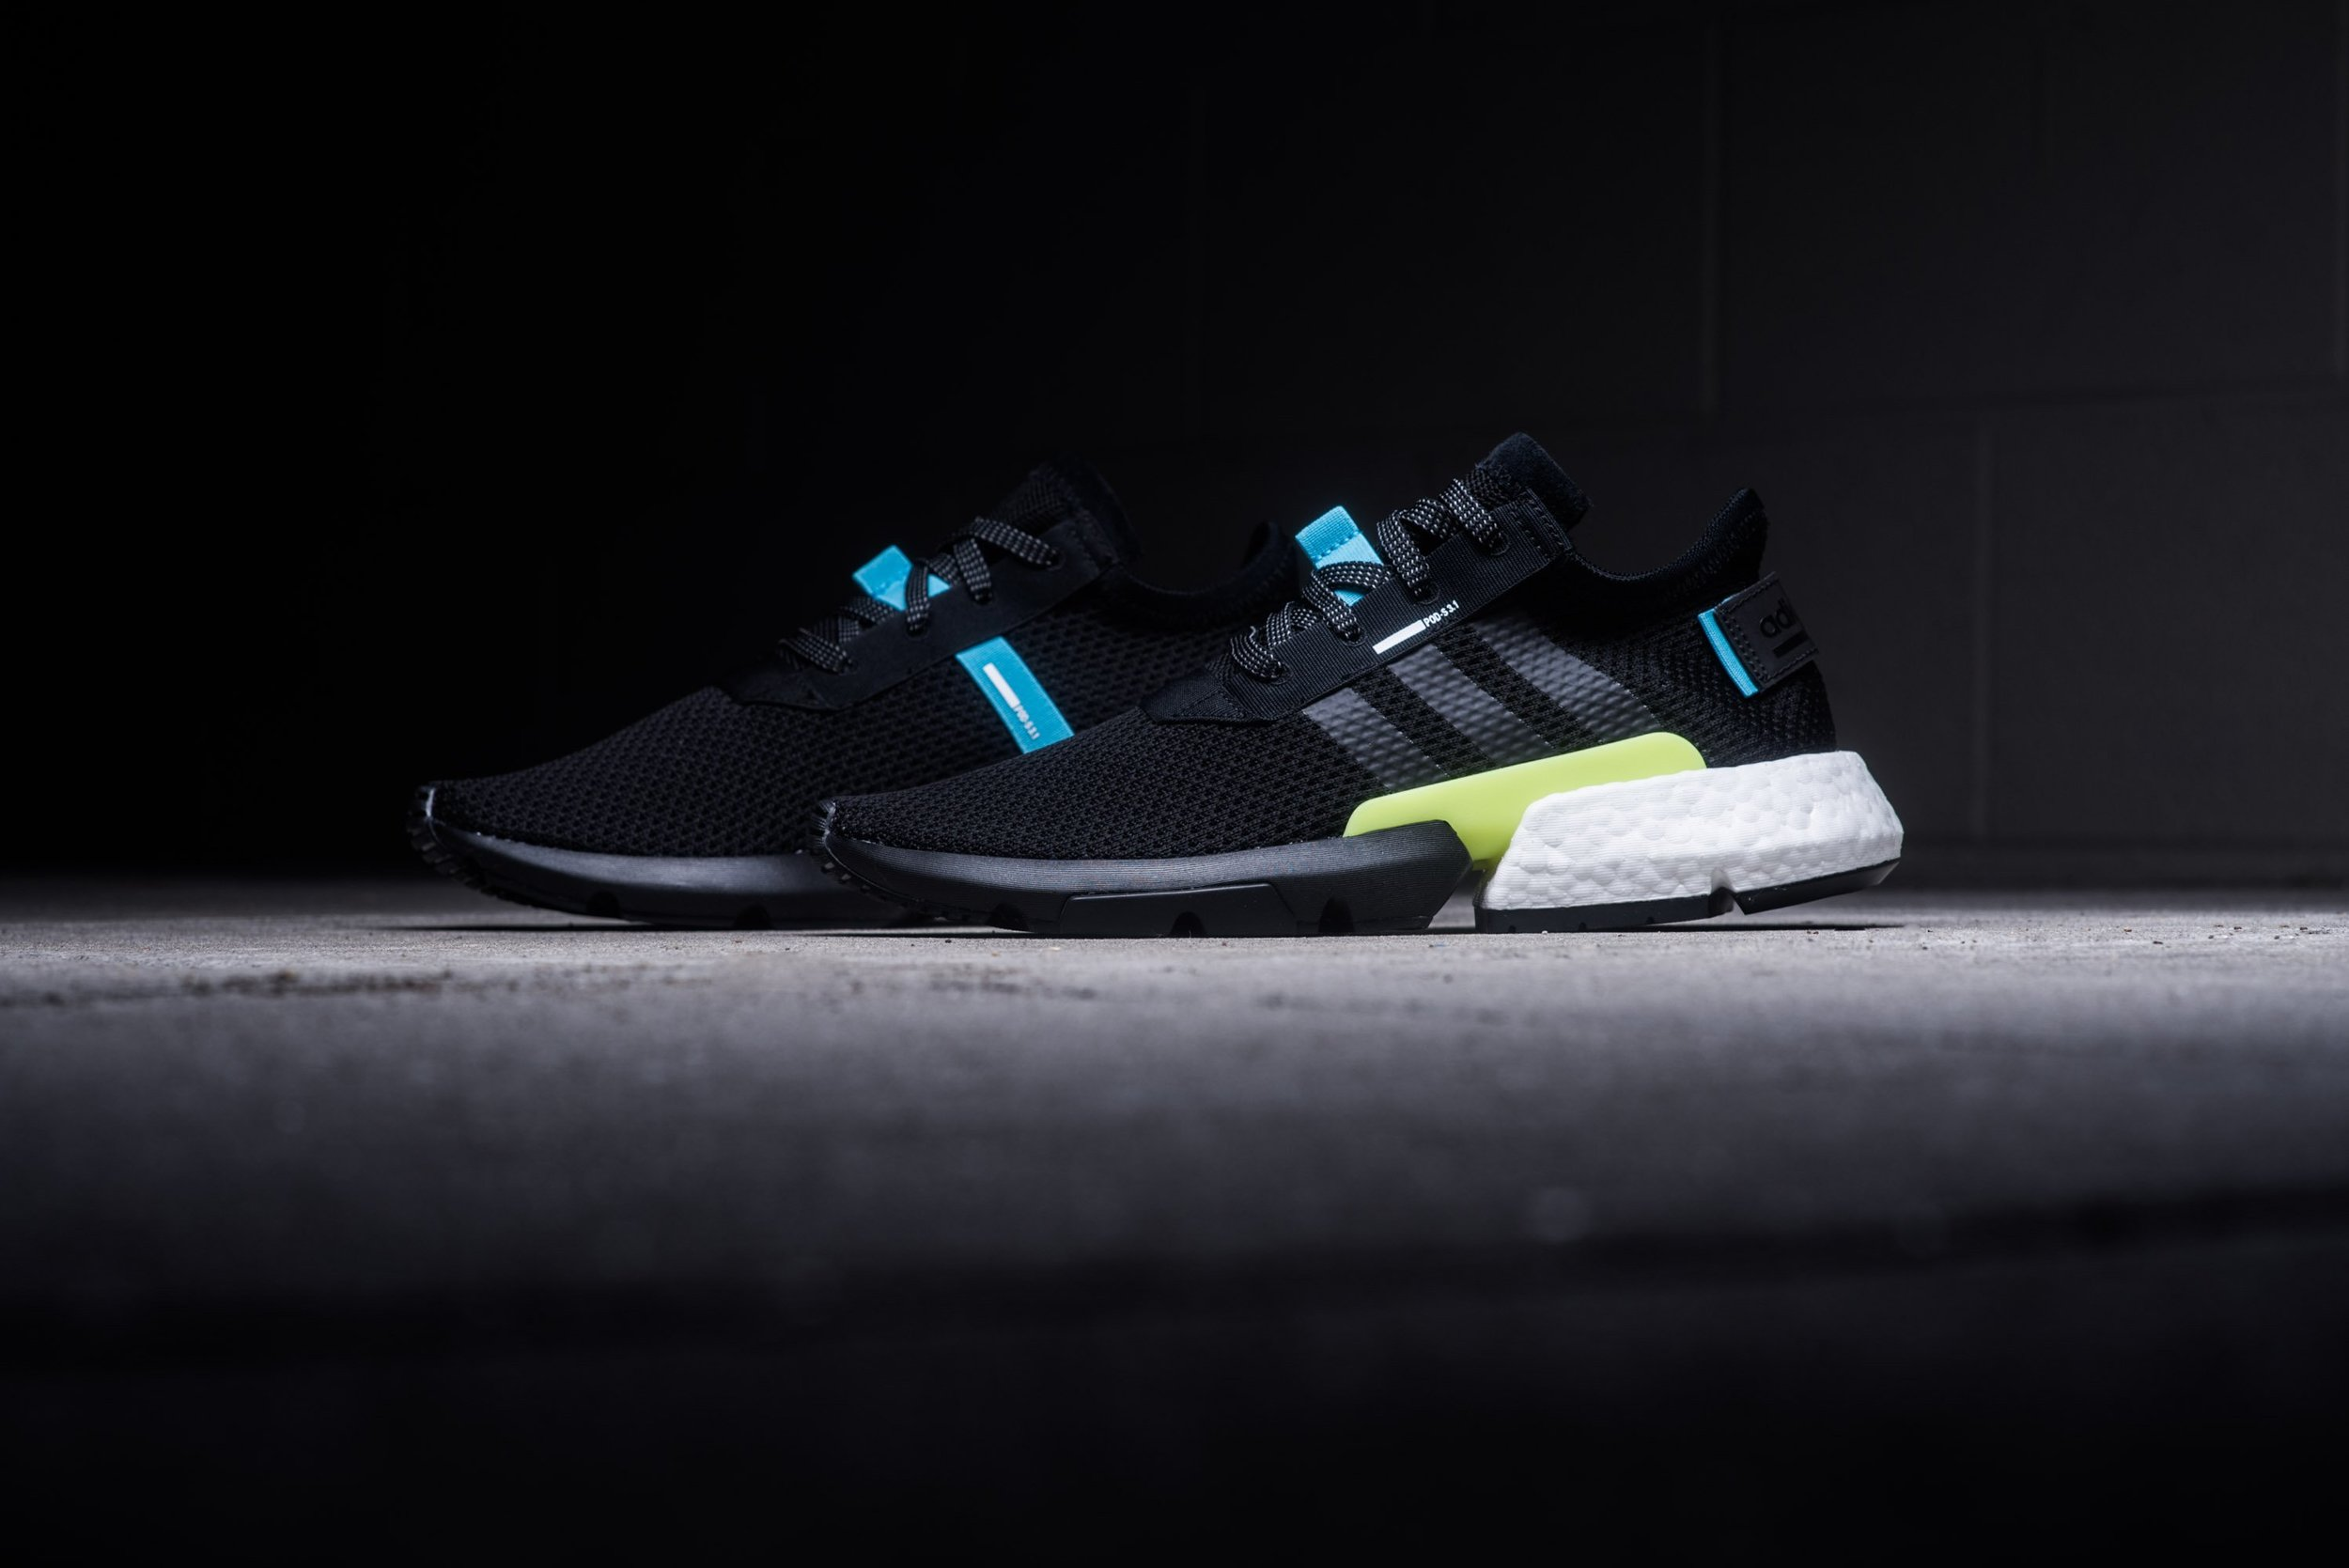 Adidas_POD-S3.1_aq1059_black_white_sneaker_politics_2.jpg